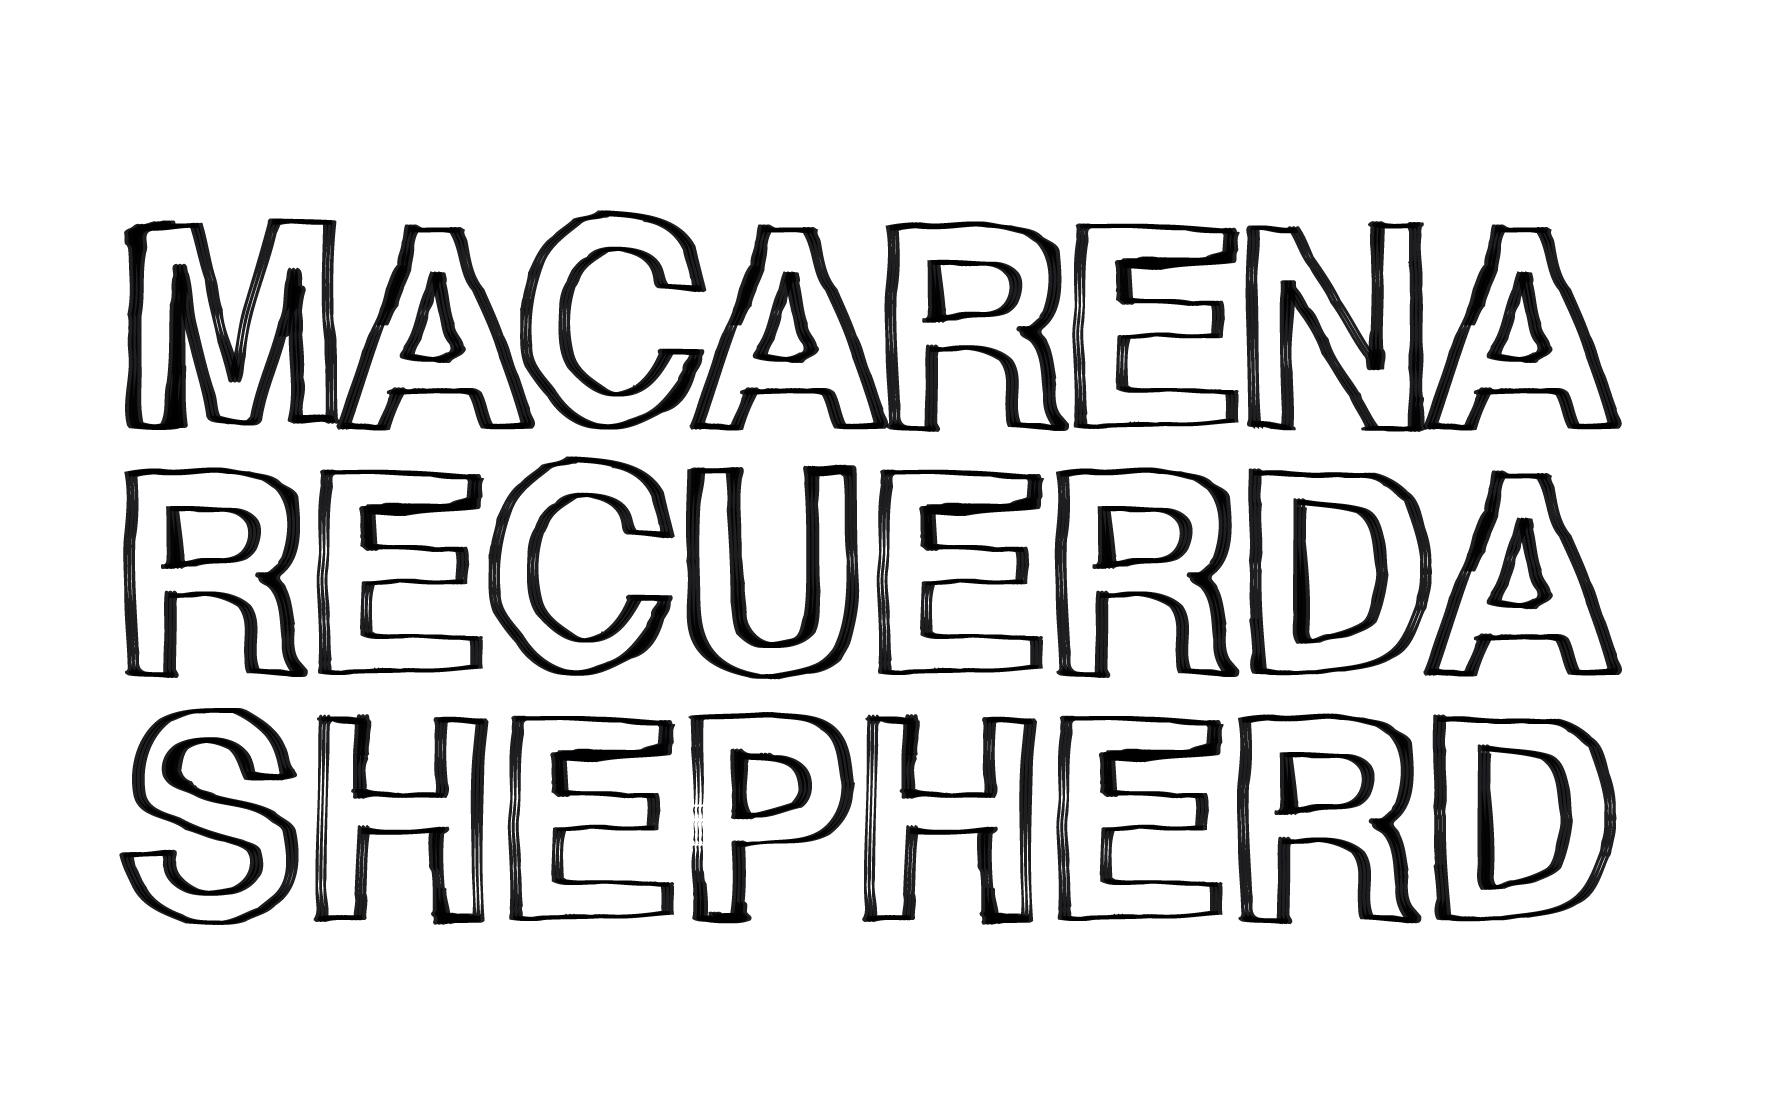 Macarena Recuerda Shepherd